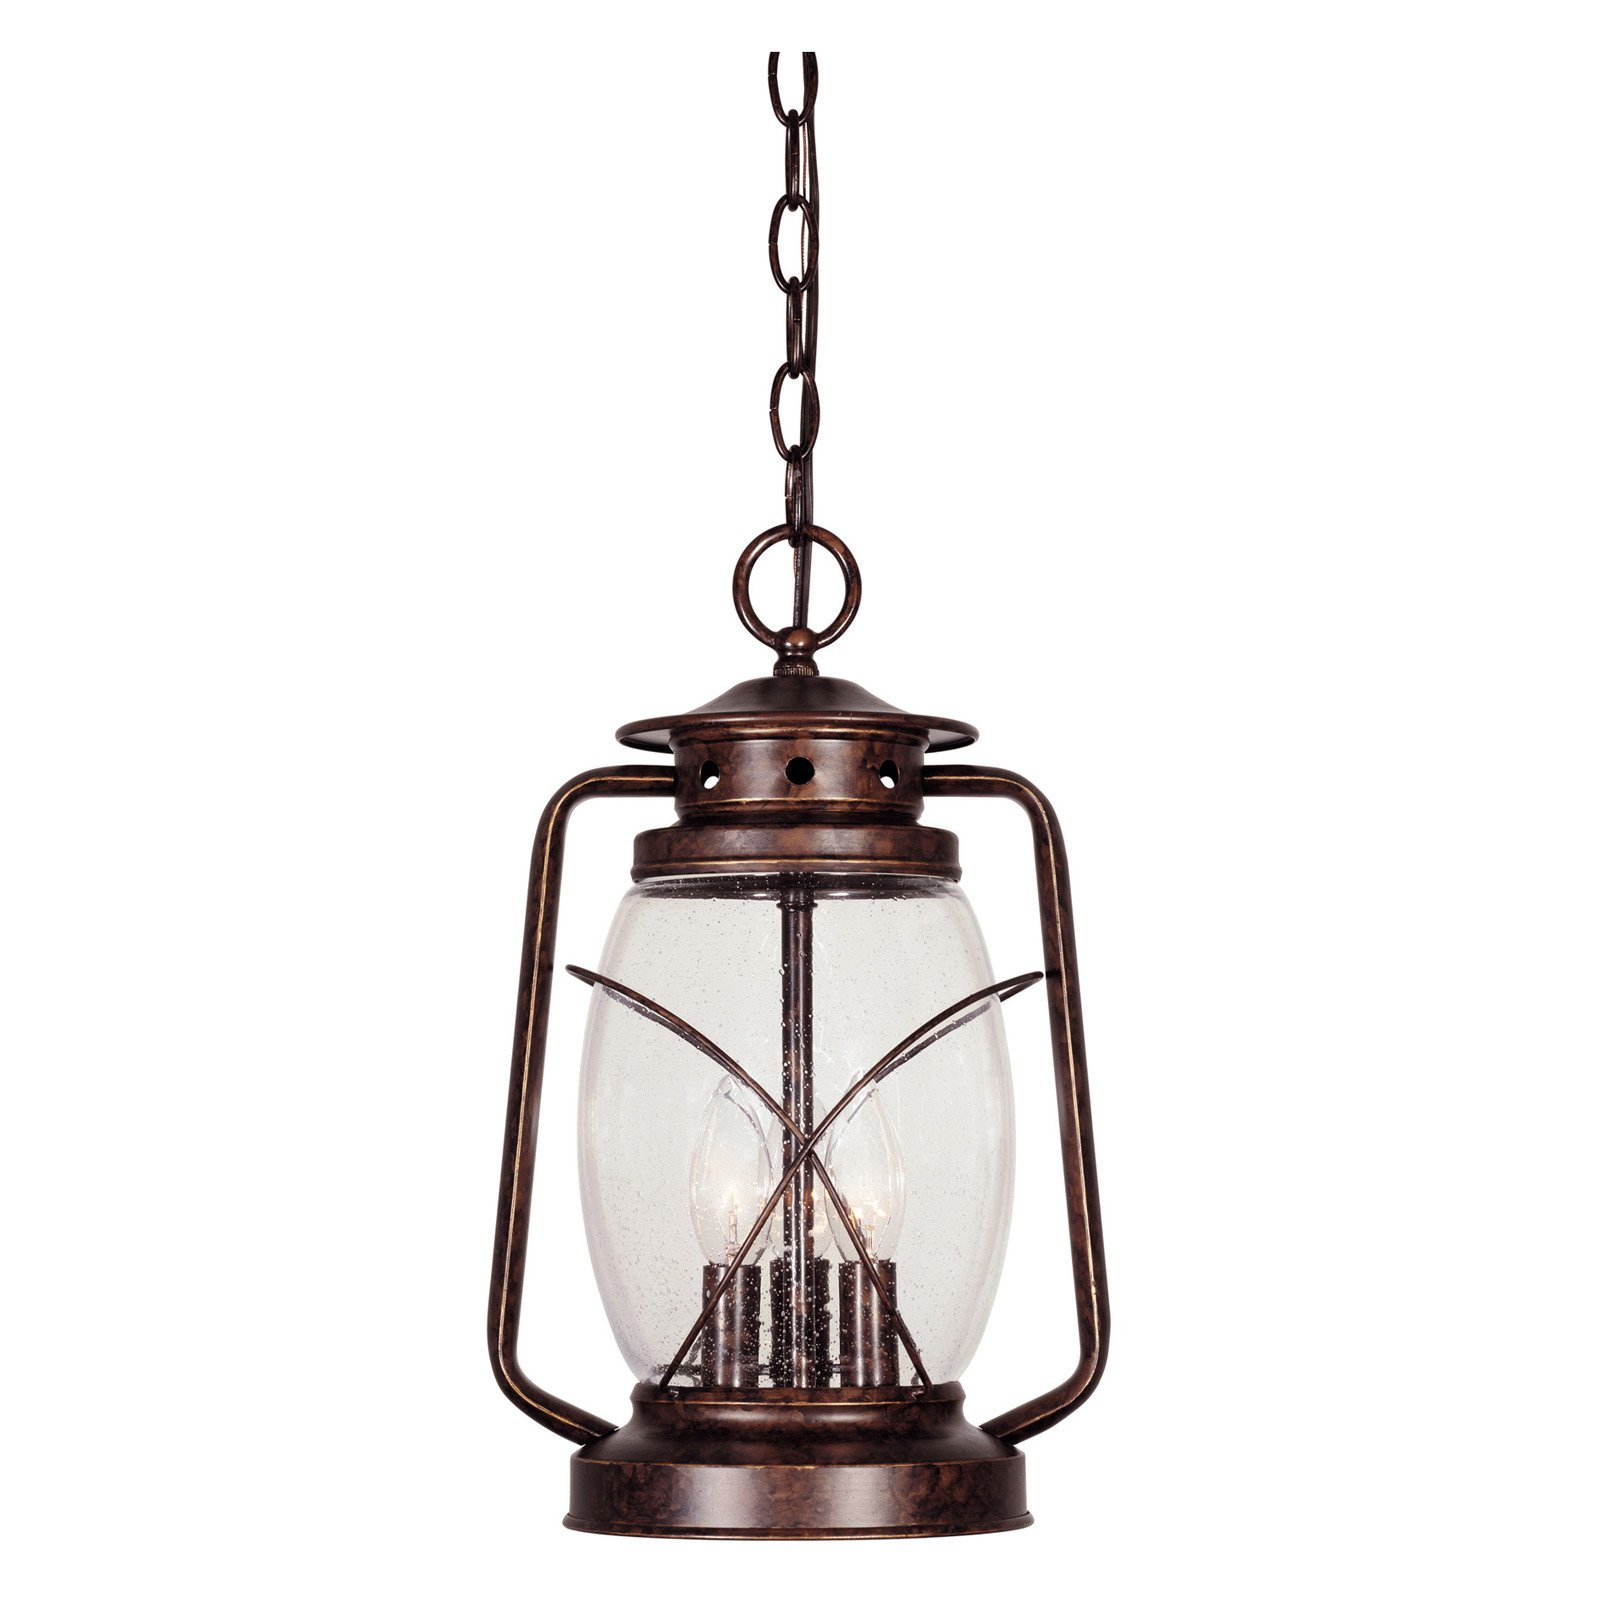 Savoy House Smith Mountain 5-3414-56 Outdoor Hanging Lantern by Savoy House